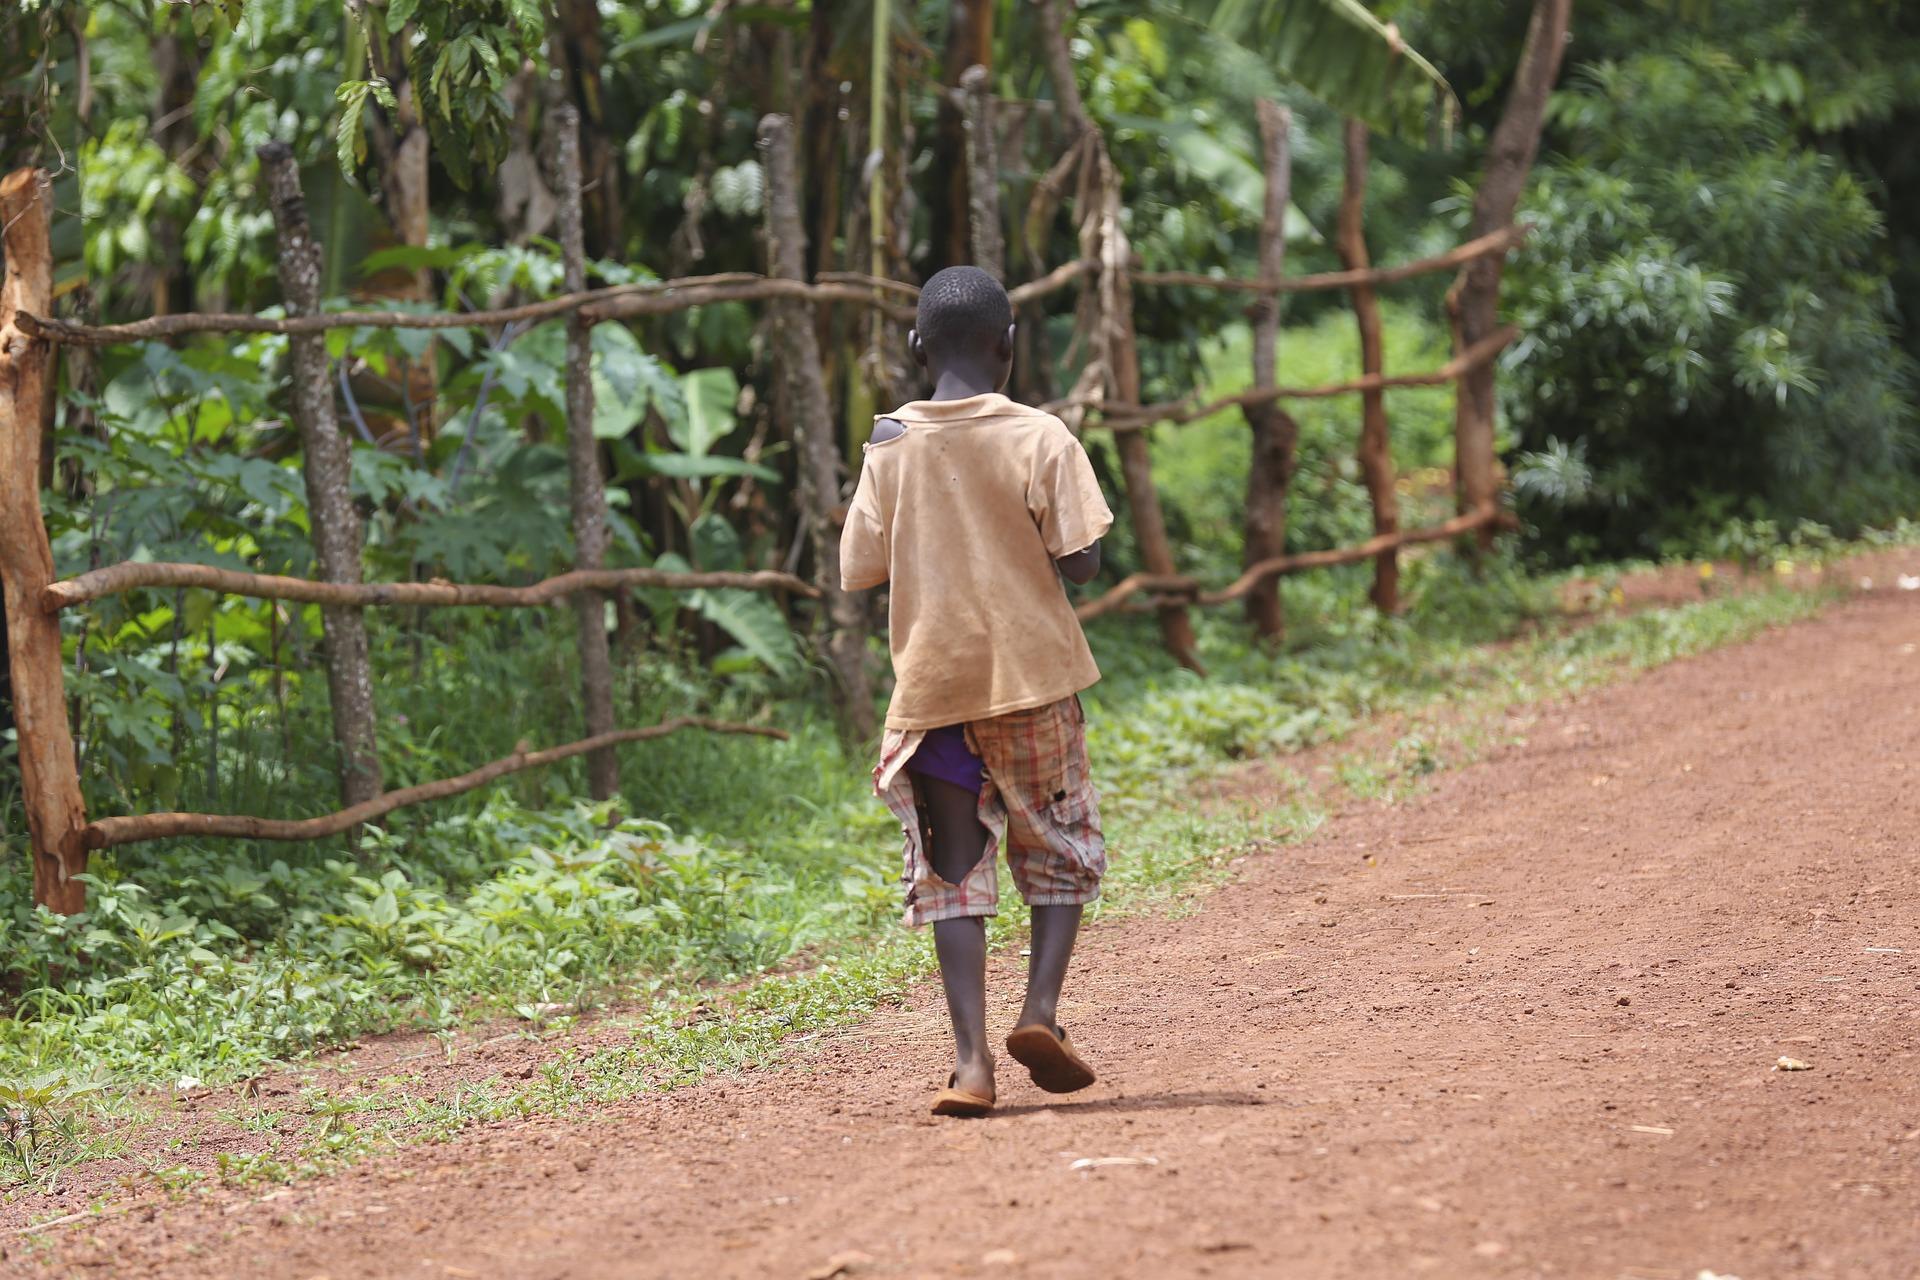 Un nen en situació de pobresa a Madagscar / Pixabay